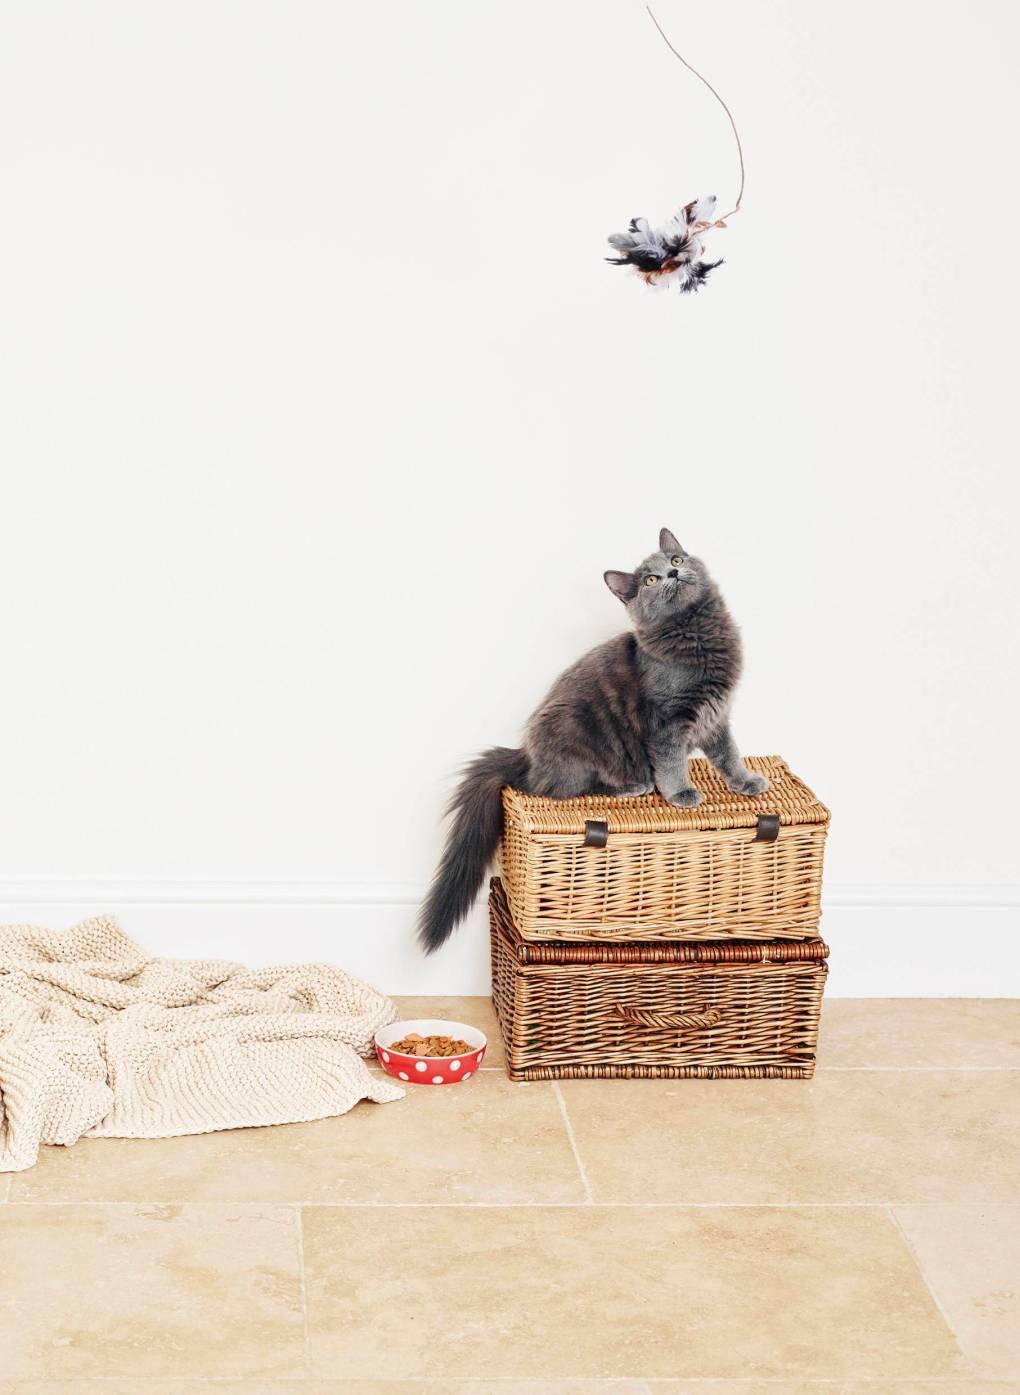 Cat Image_Tesco Bank